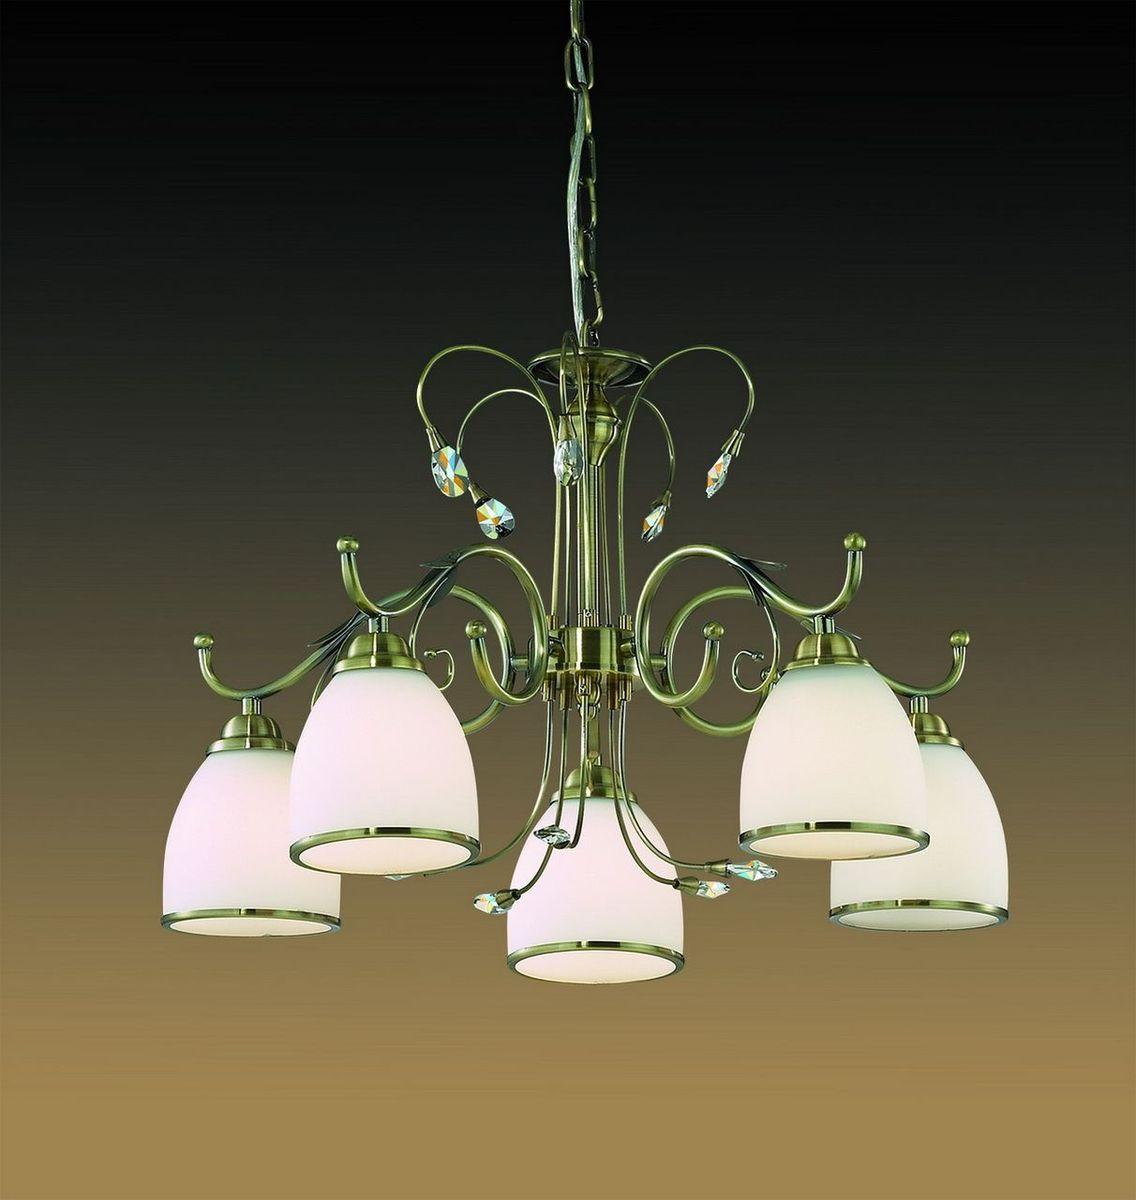 Люстра подвесная Odeon Light Mida, 5 х E27, 60W. 2242/52242/5